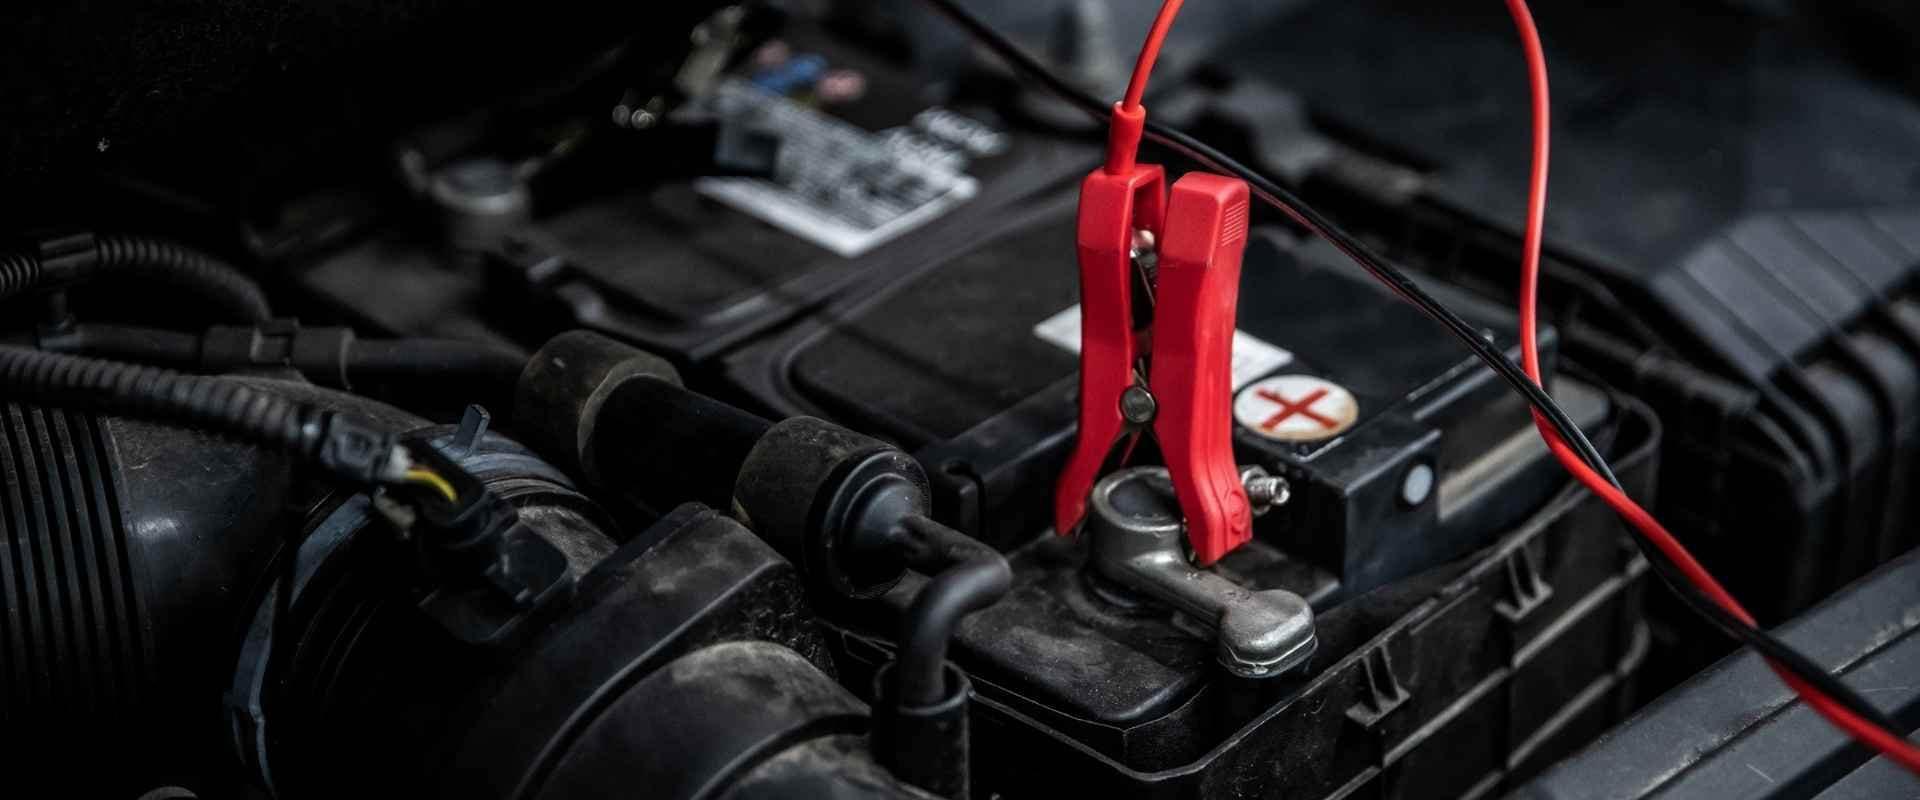 How Do Car Batteries Work